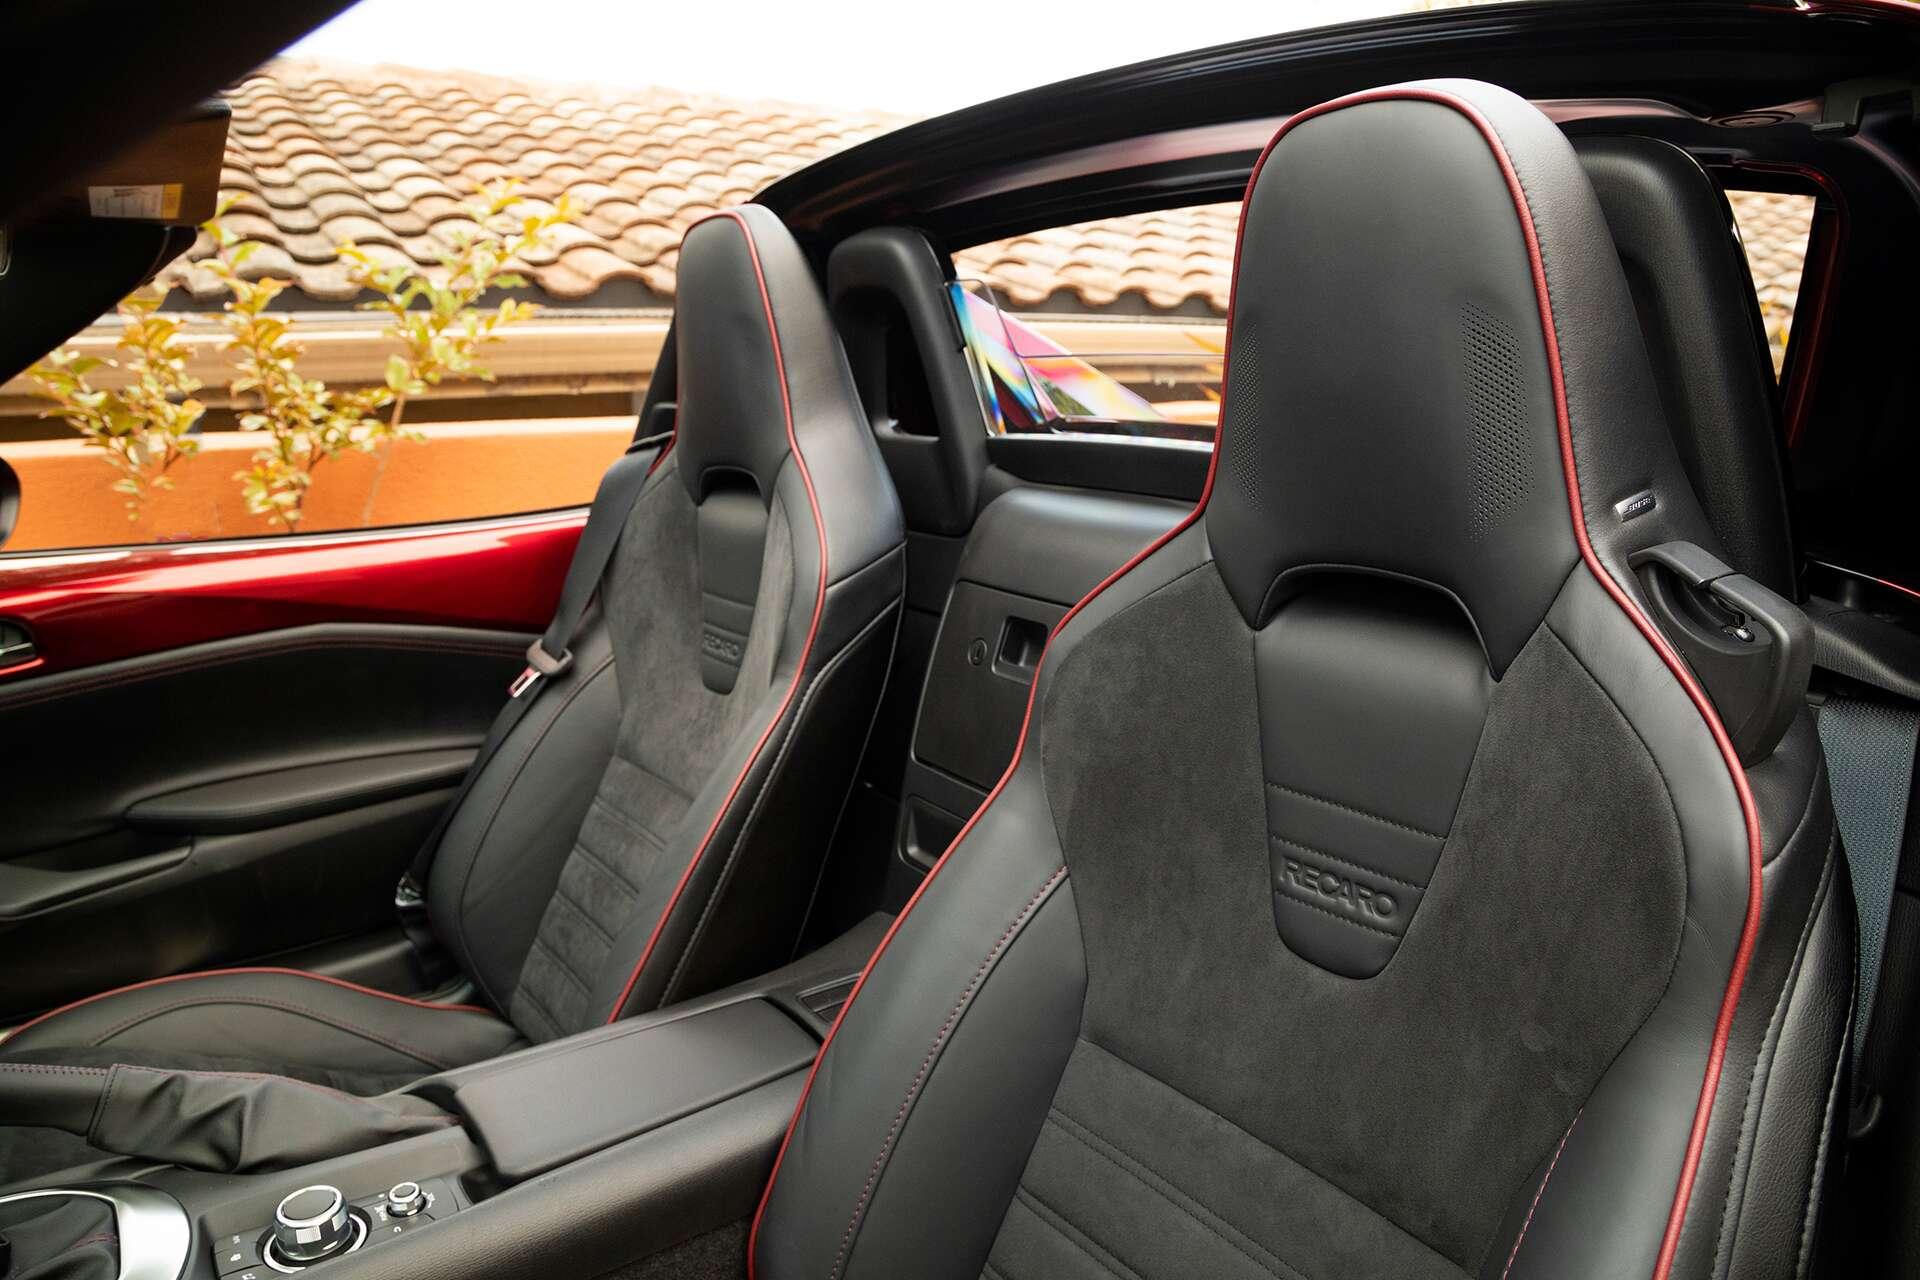 2019 mazda mx 5 rf club test drive review more horsepower. Black Bedroom Furniture Sets. Home Design Ideas